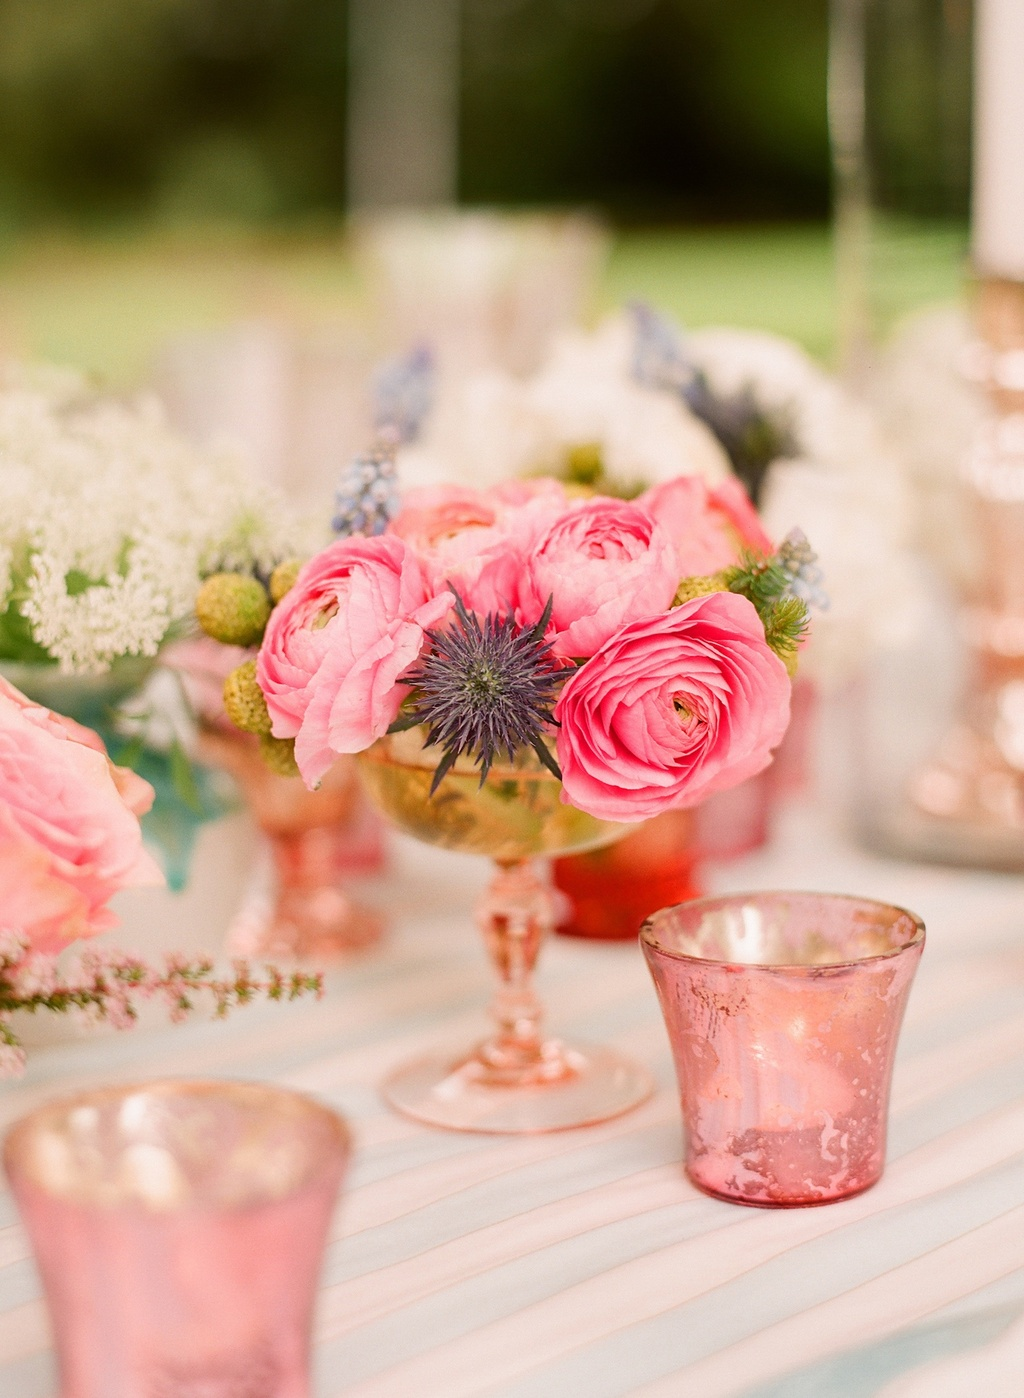 Romantic-wedding-details-outdoor-weddings-pink-centerpiece-votives.full